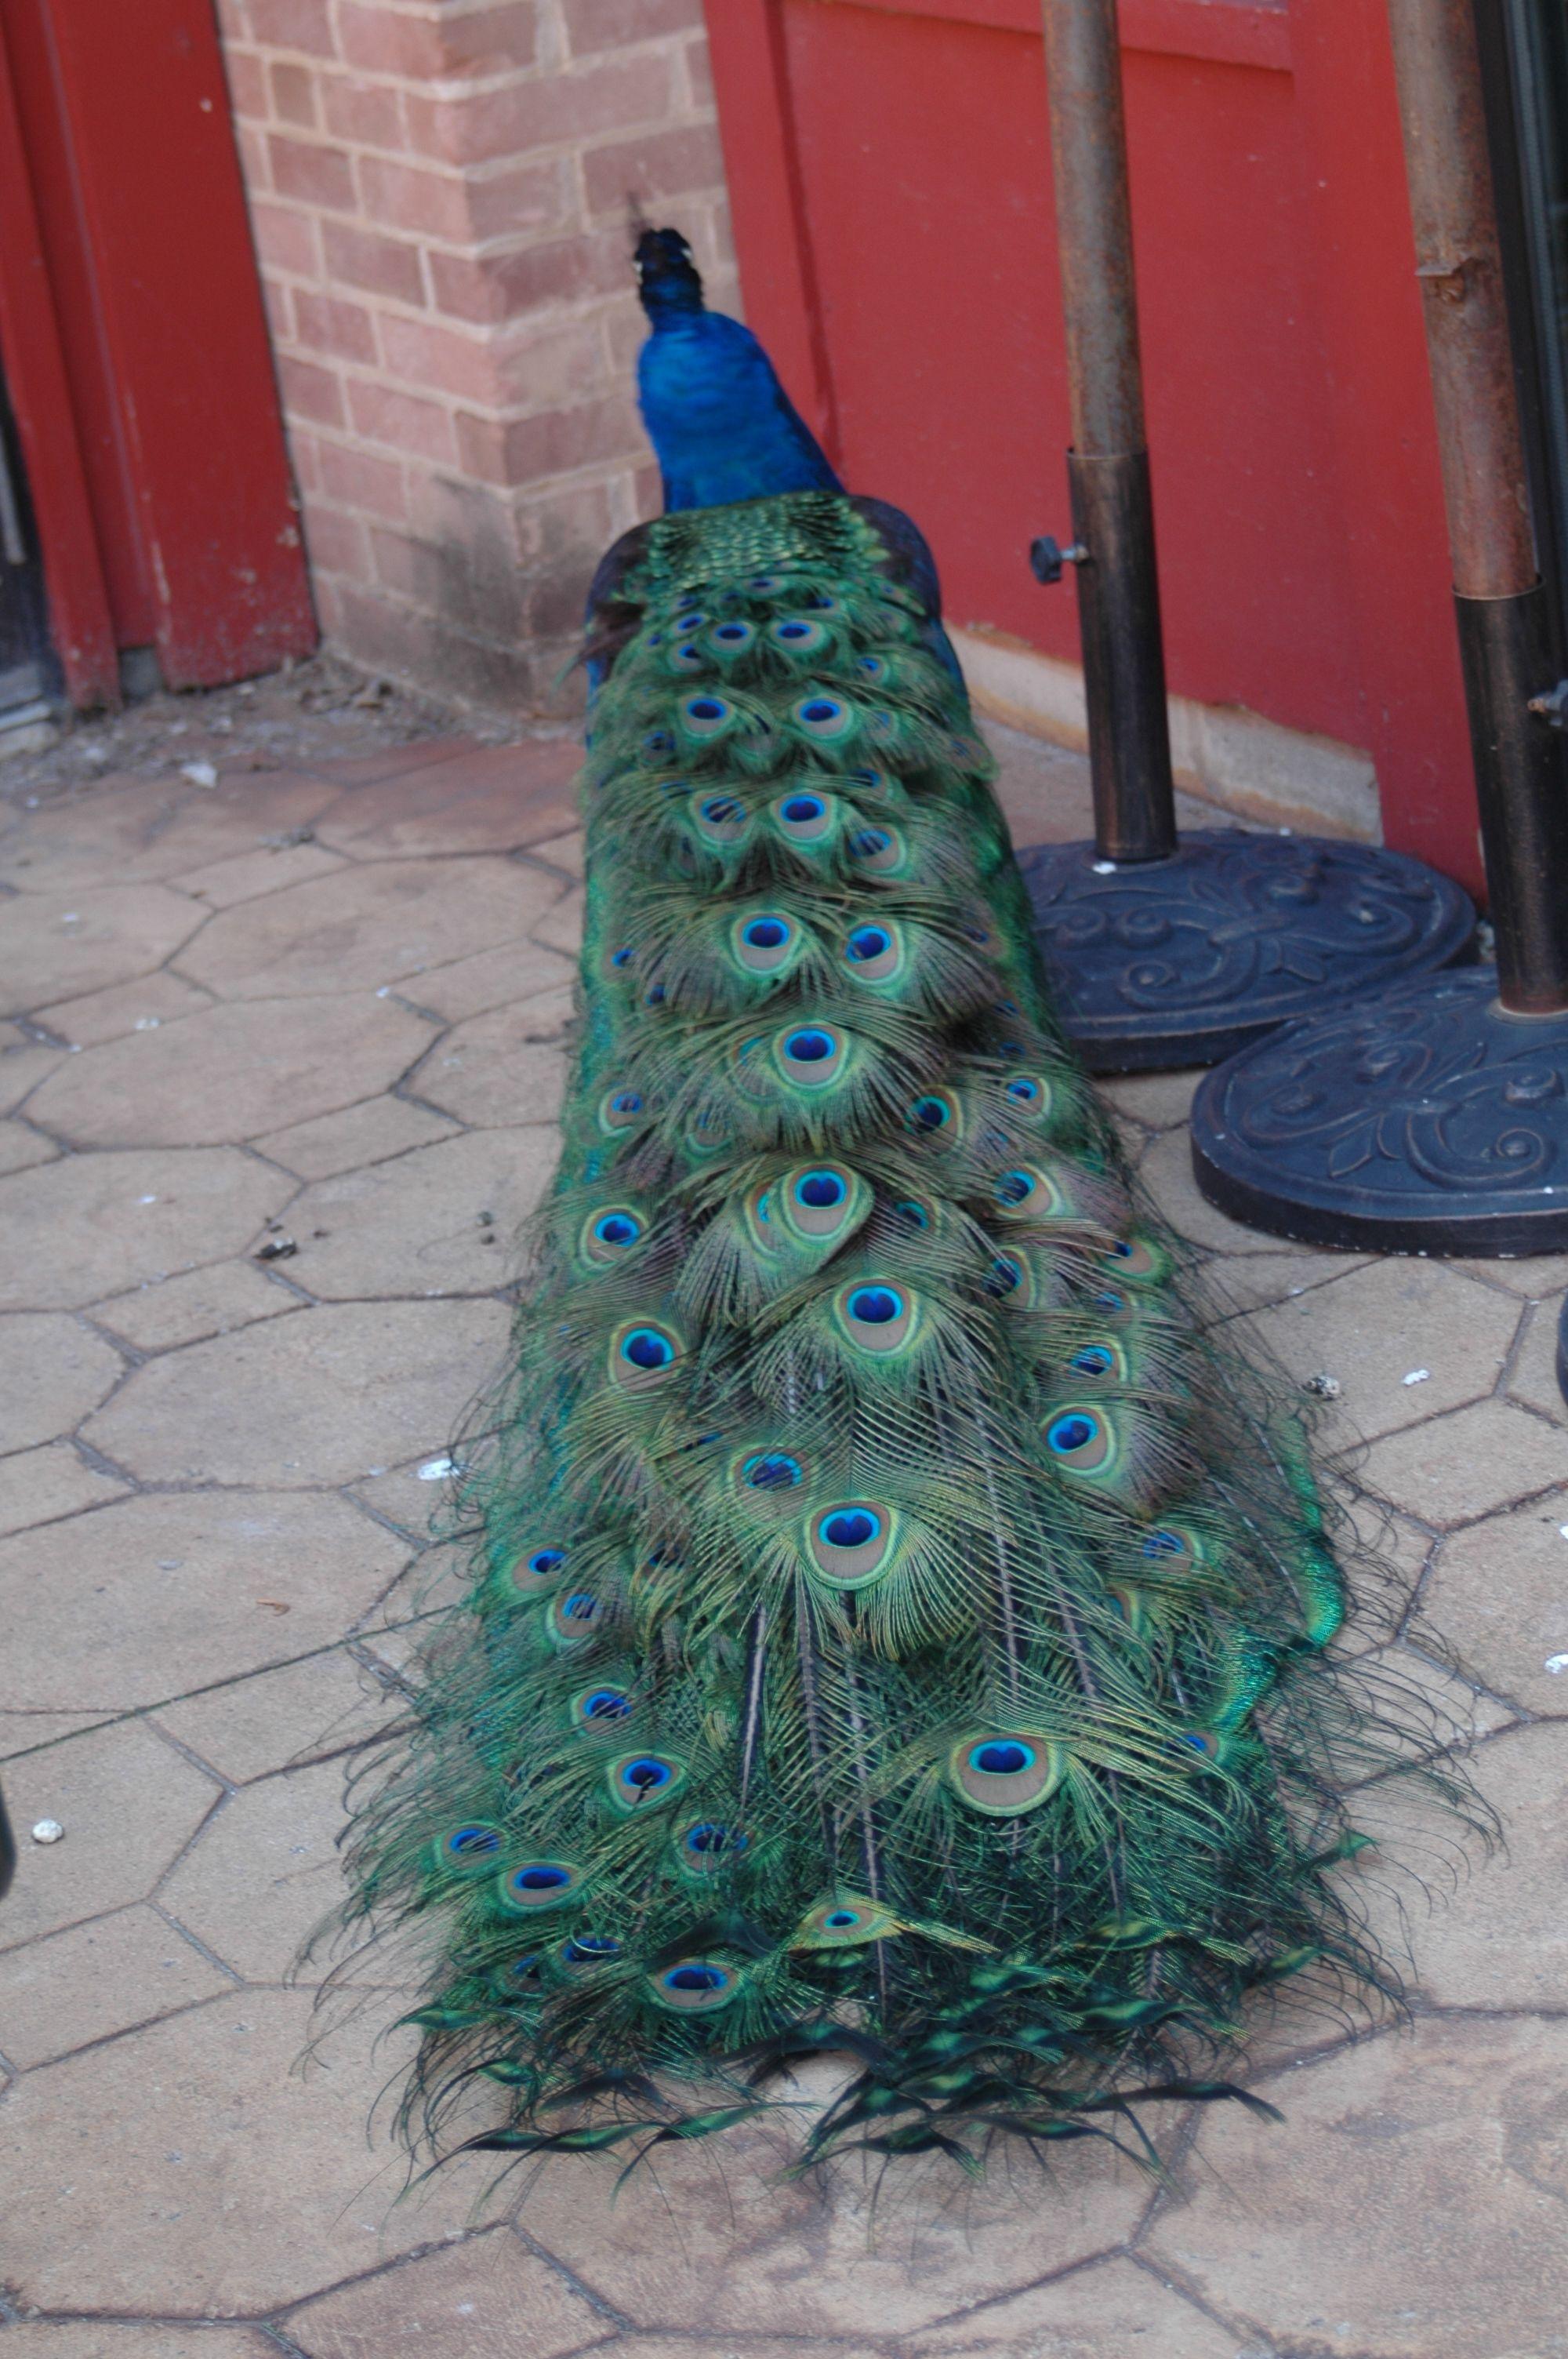 Peacock in New Ulm Minnesota 2012